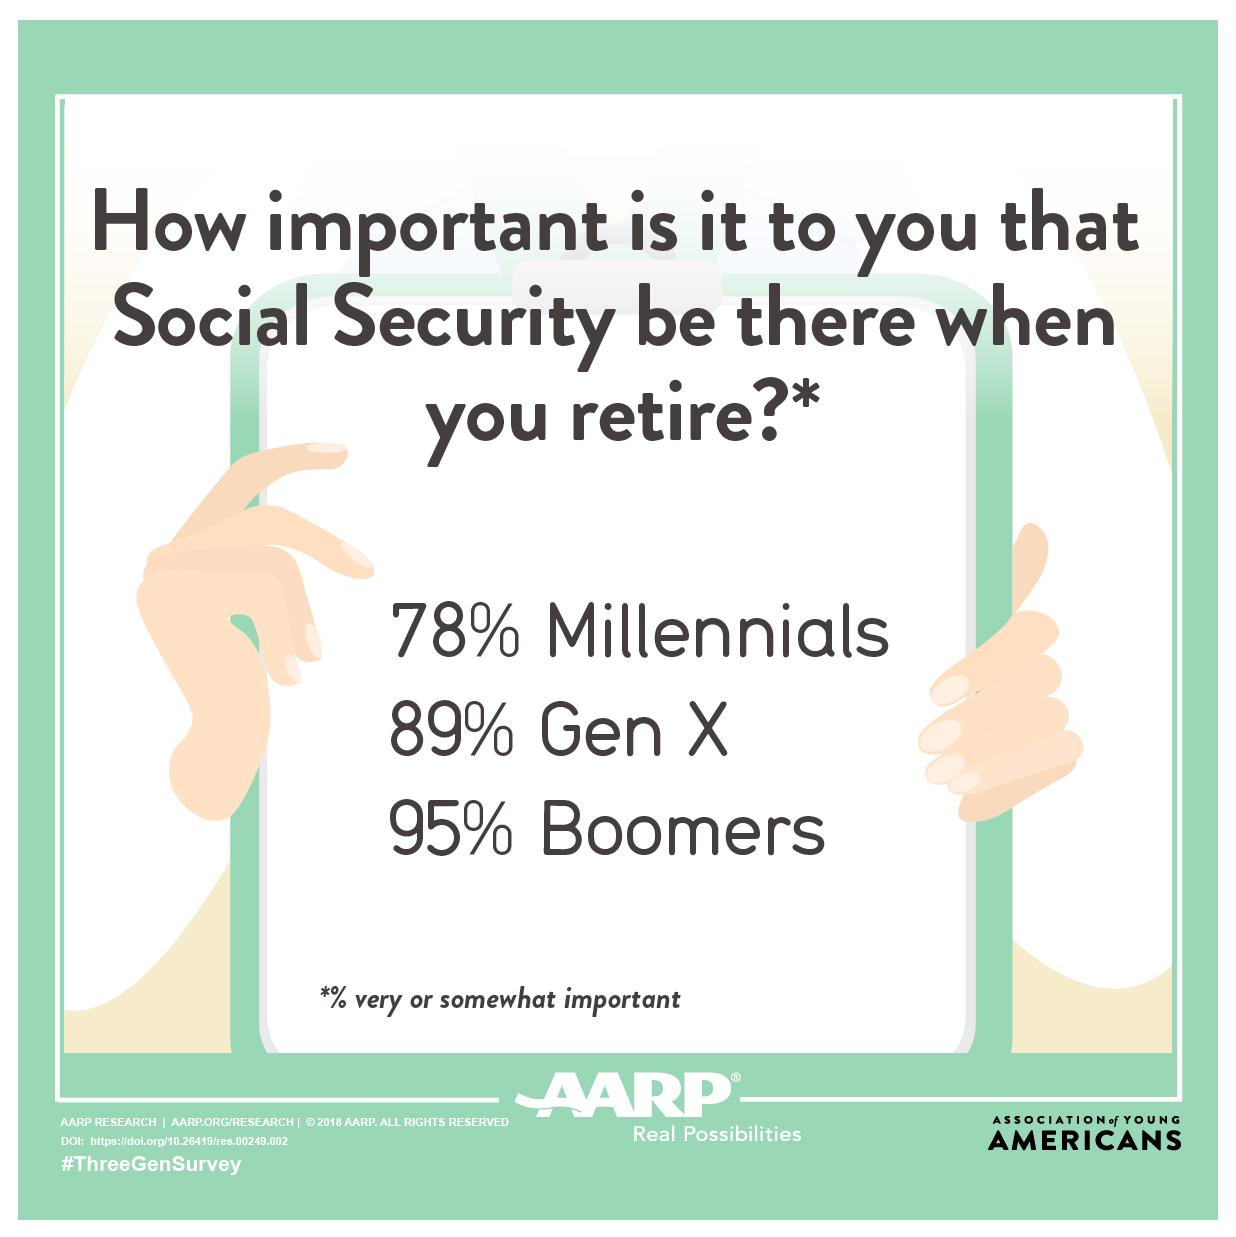 Three Generation Survey: Social Security Graphic